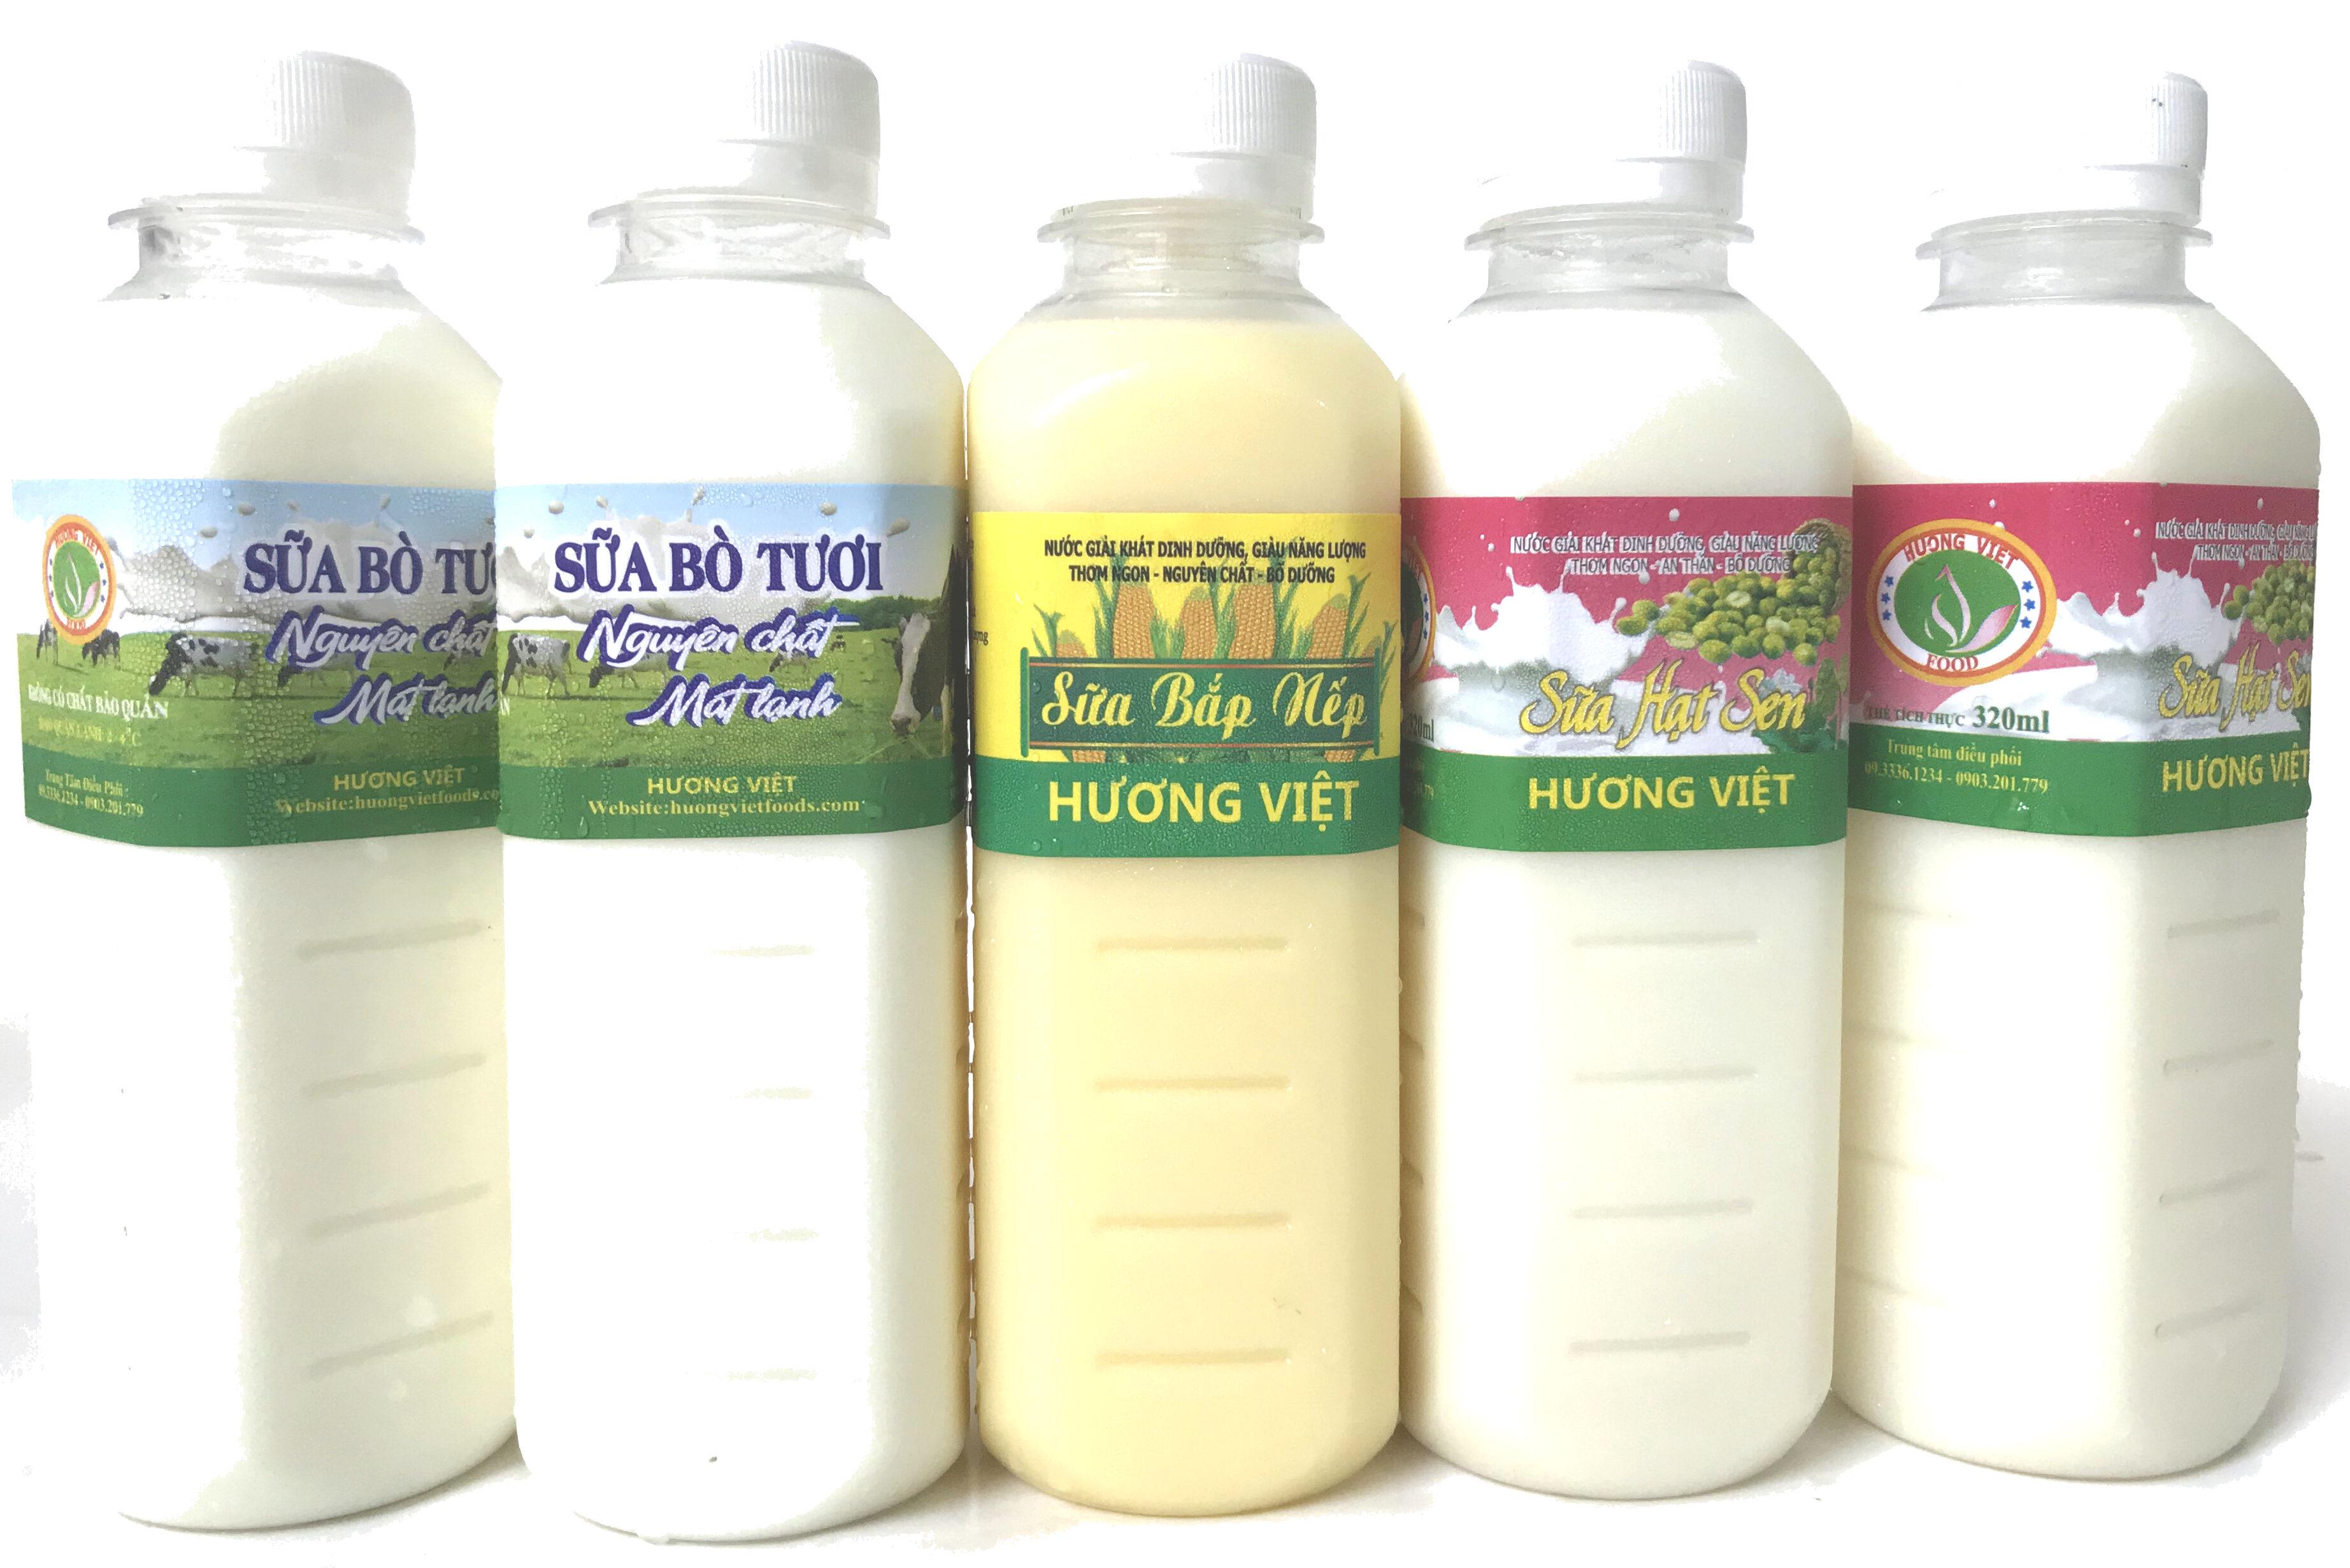 Sữa Bắp Nếp Hương Việt - Recycling instructions and/or packaging information - vi